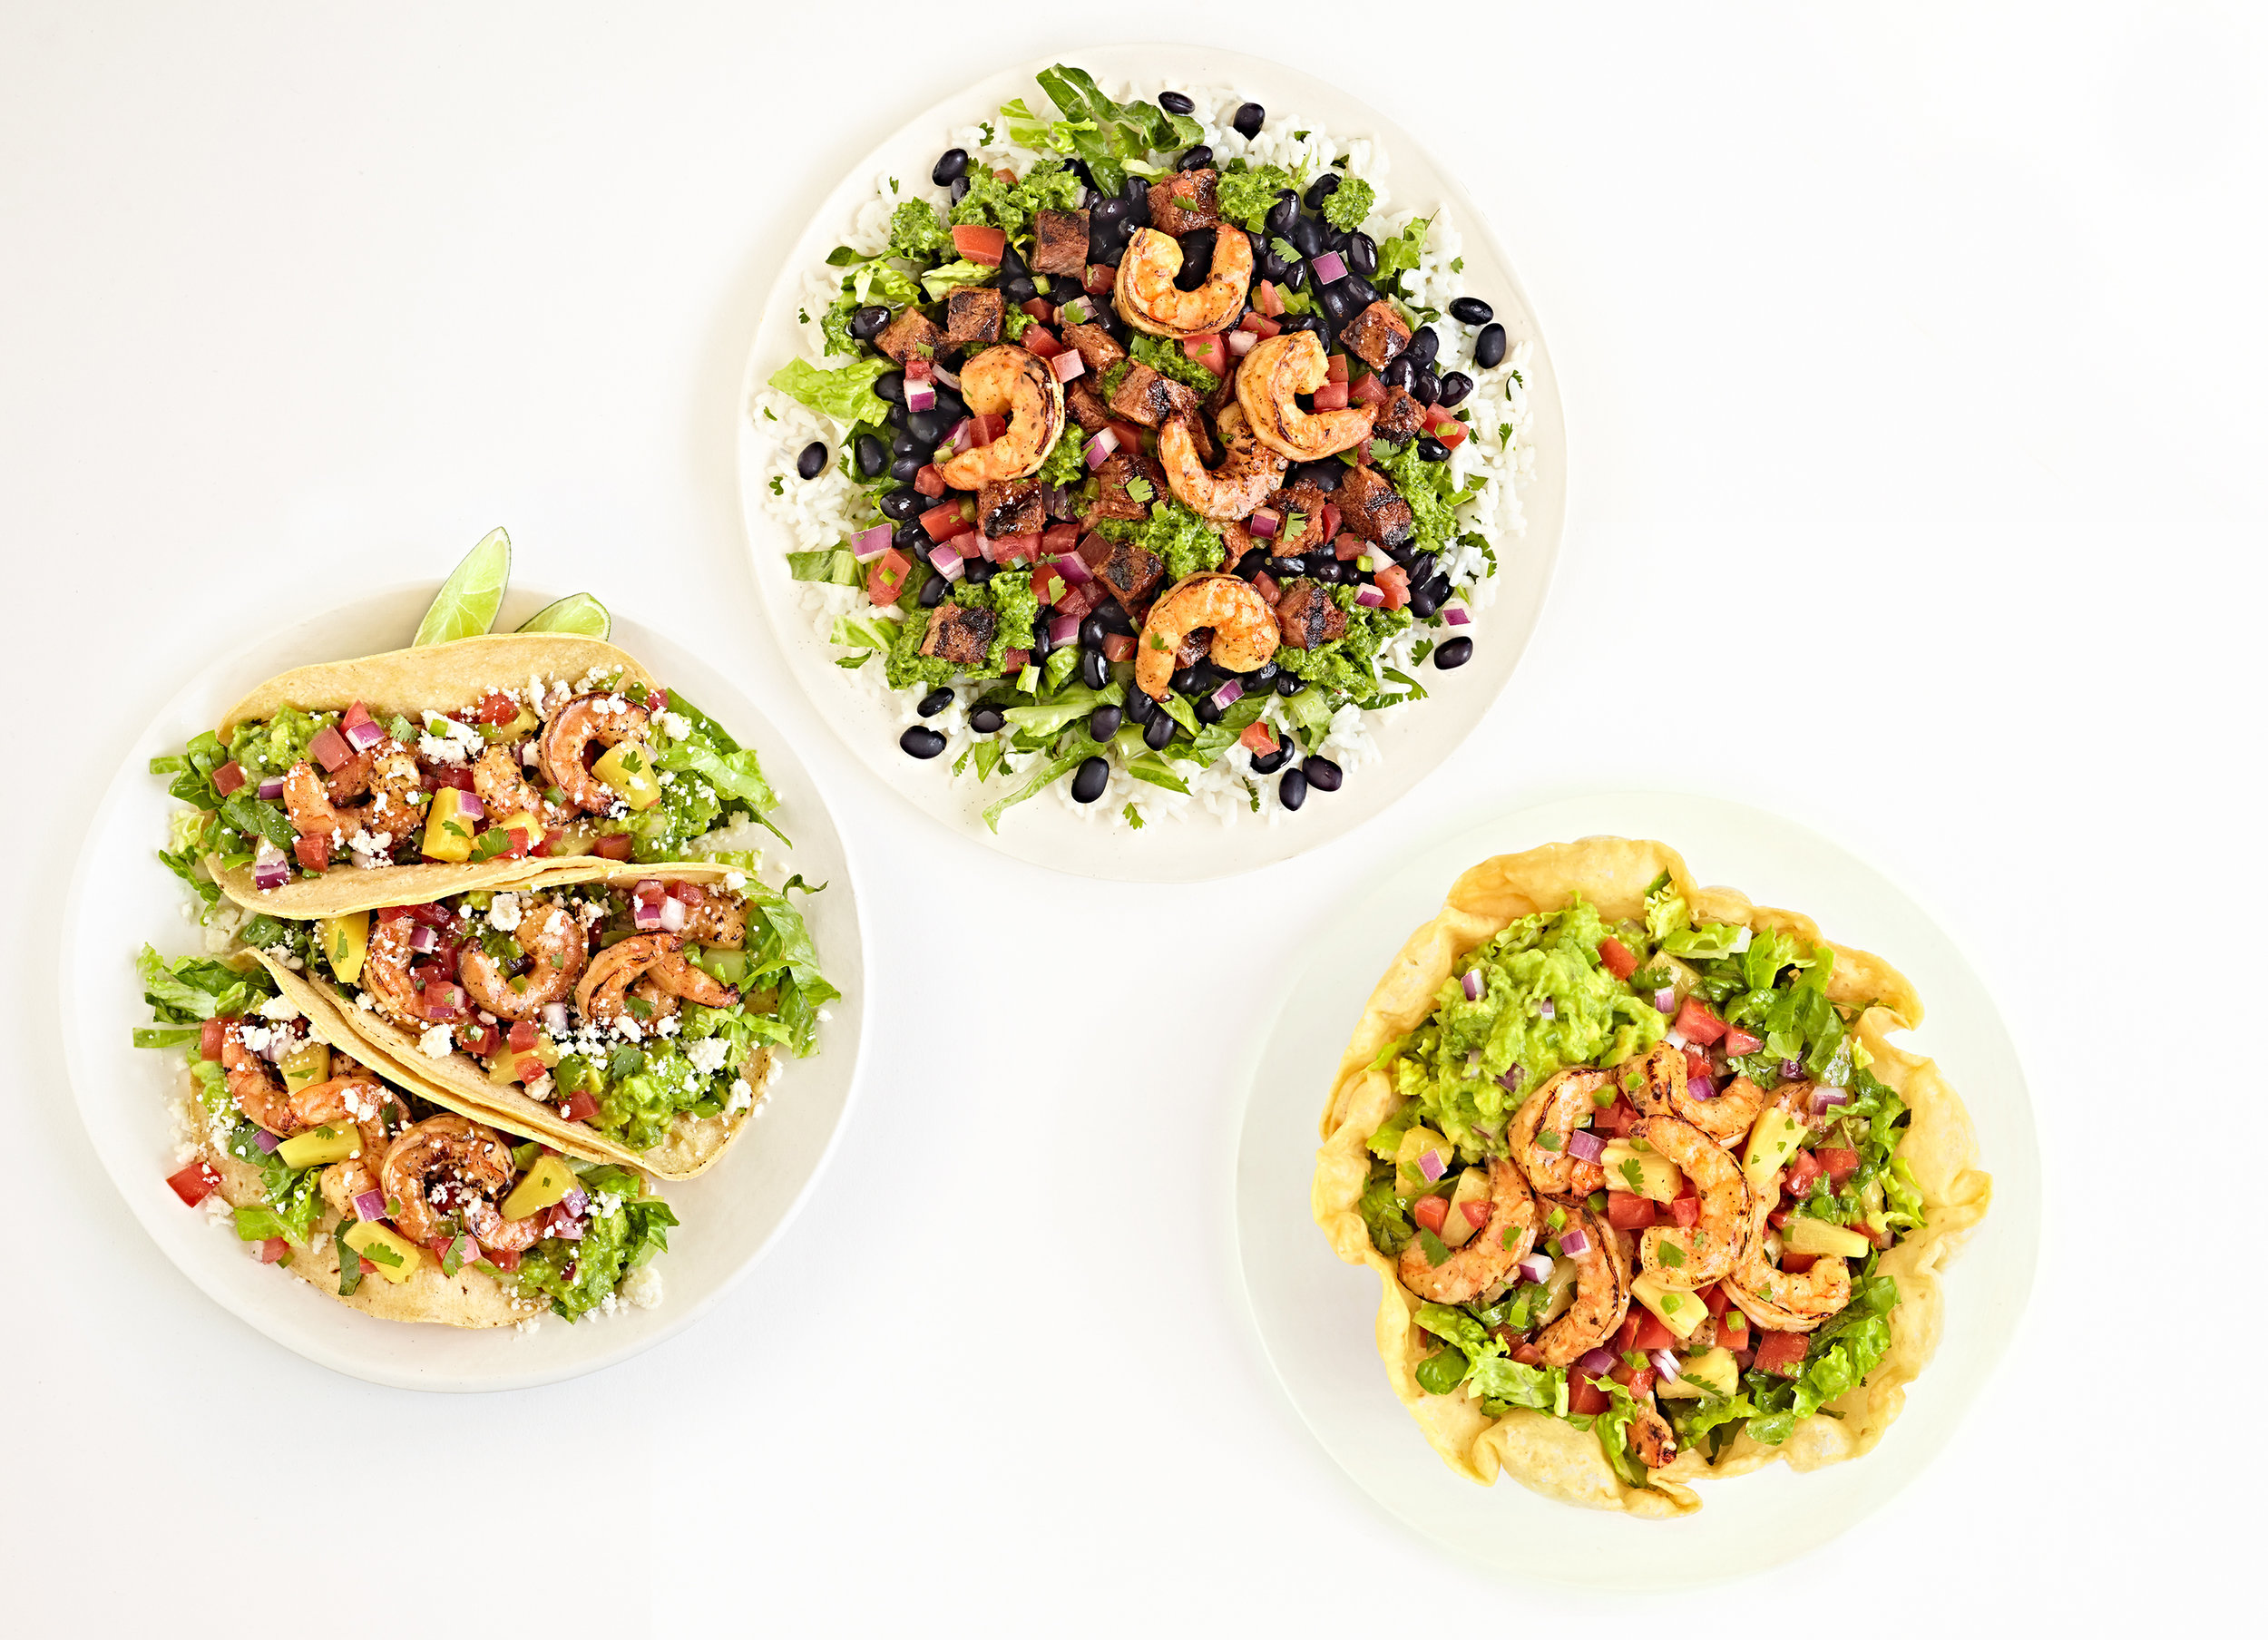 Qdoba mexican food bowls on white